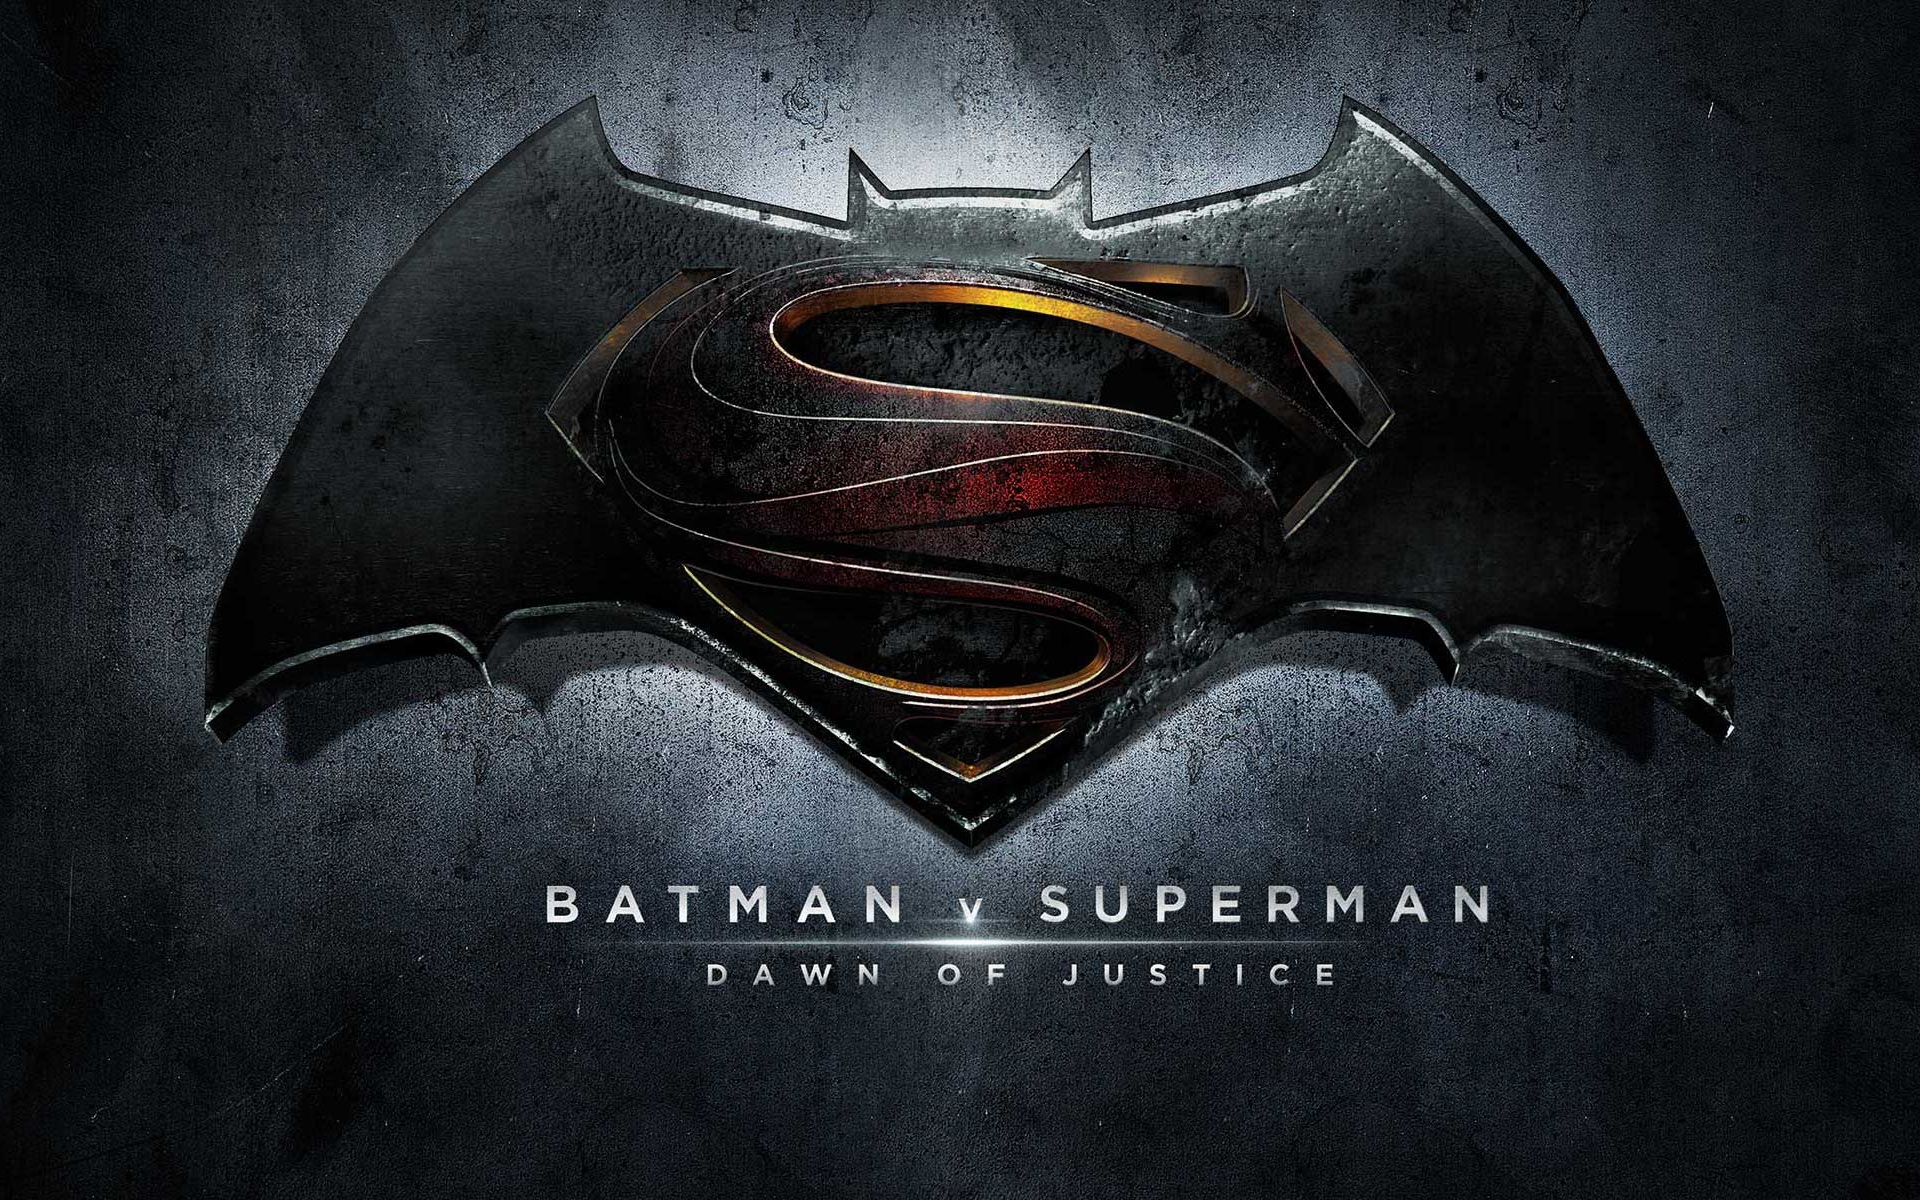 batman v superman dawn of justice wallpapers | wallpapers hd